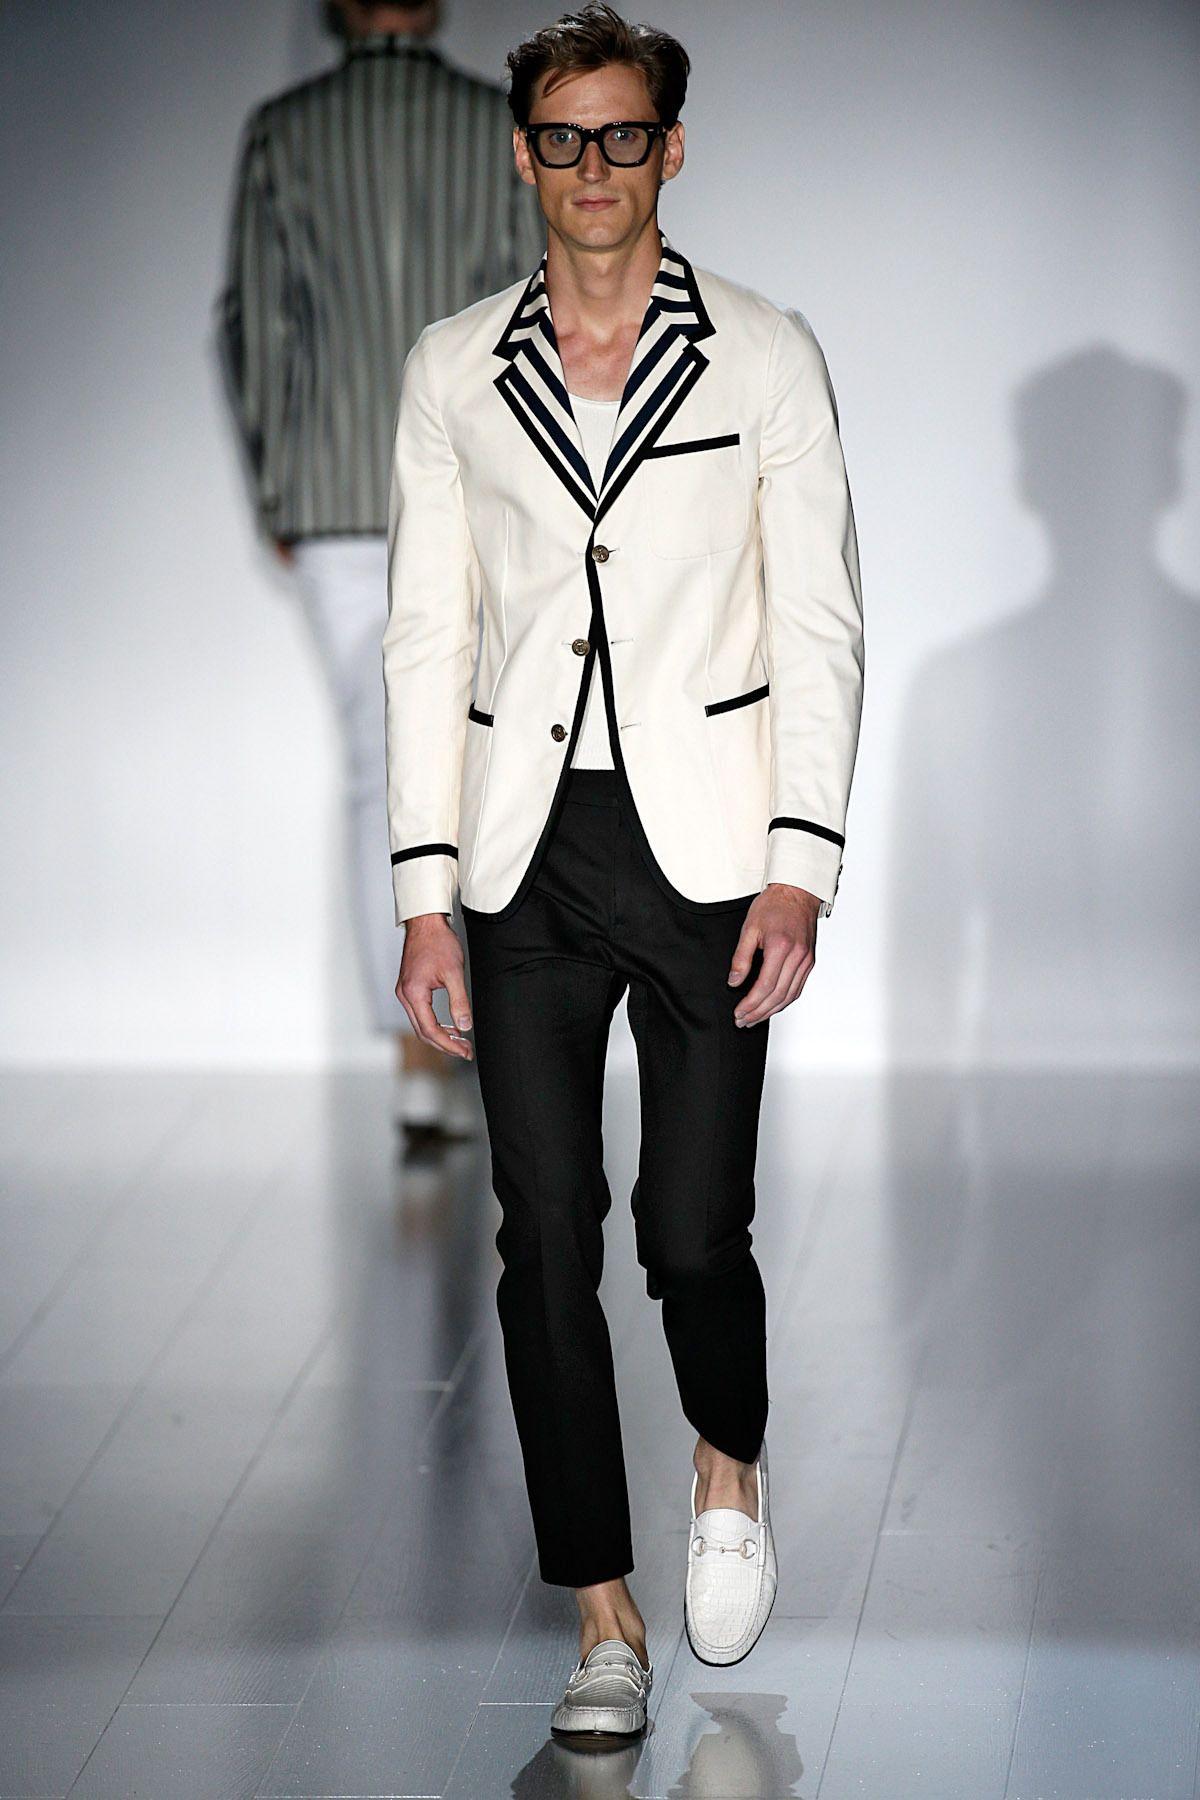 2759d83ece2 GucciMenswear Spring Summer 2015 Milan Fashion Week June 2014 ...